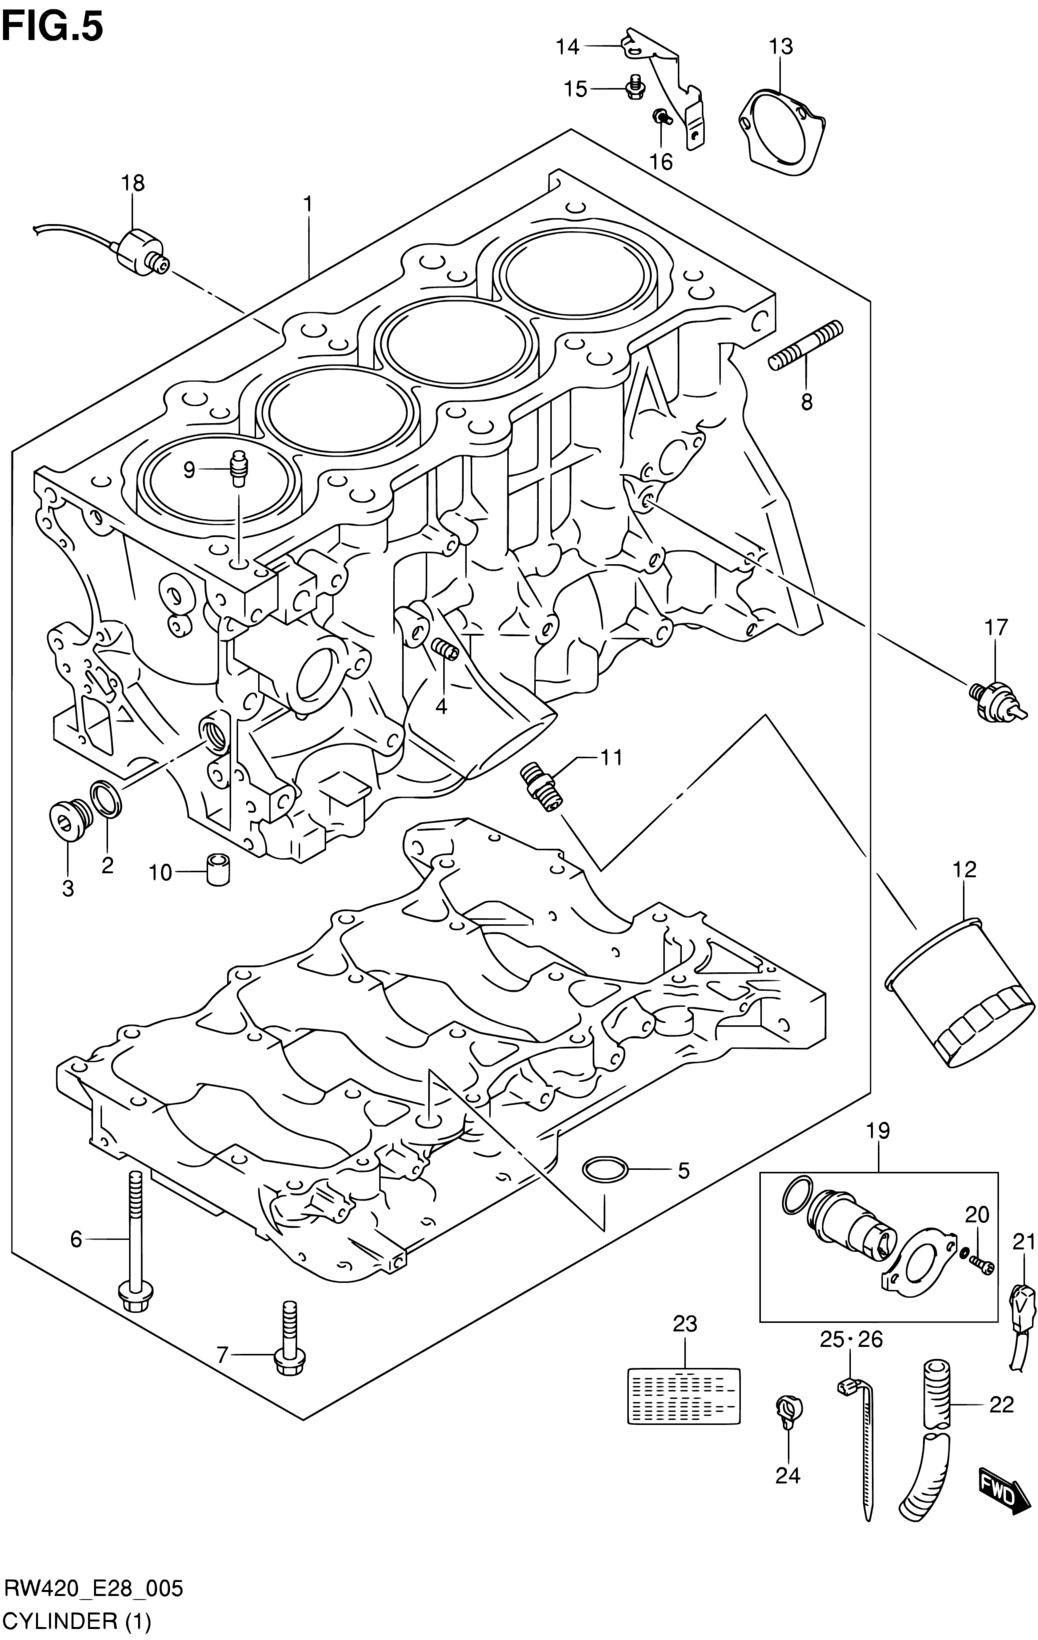 All Regions Sx4 Rw420 E28my 2009 Engine 5 Cylinder J20a Suzuki Diagram Parts